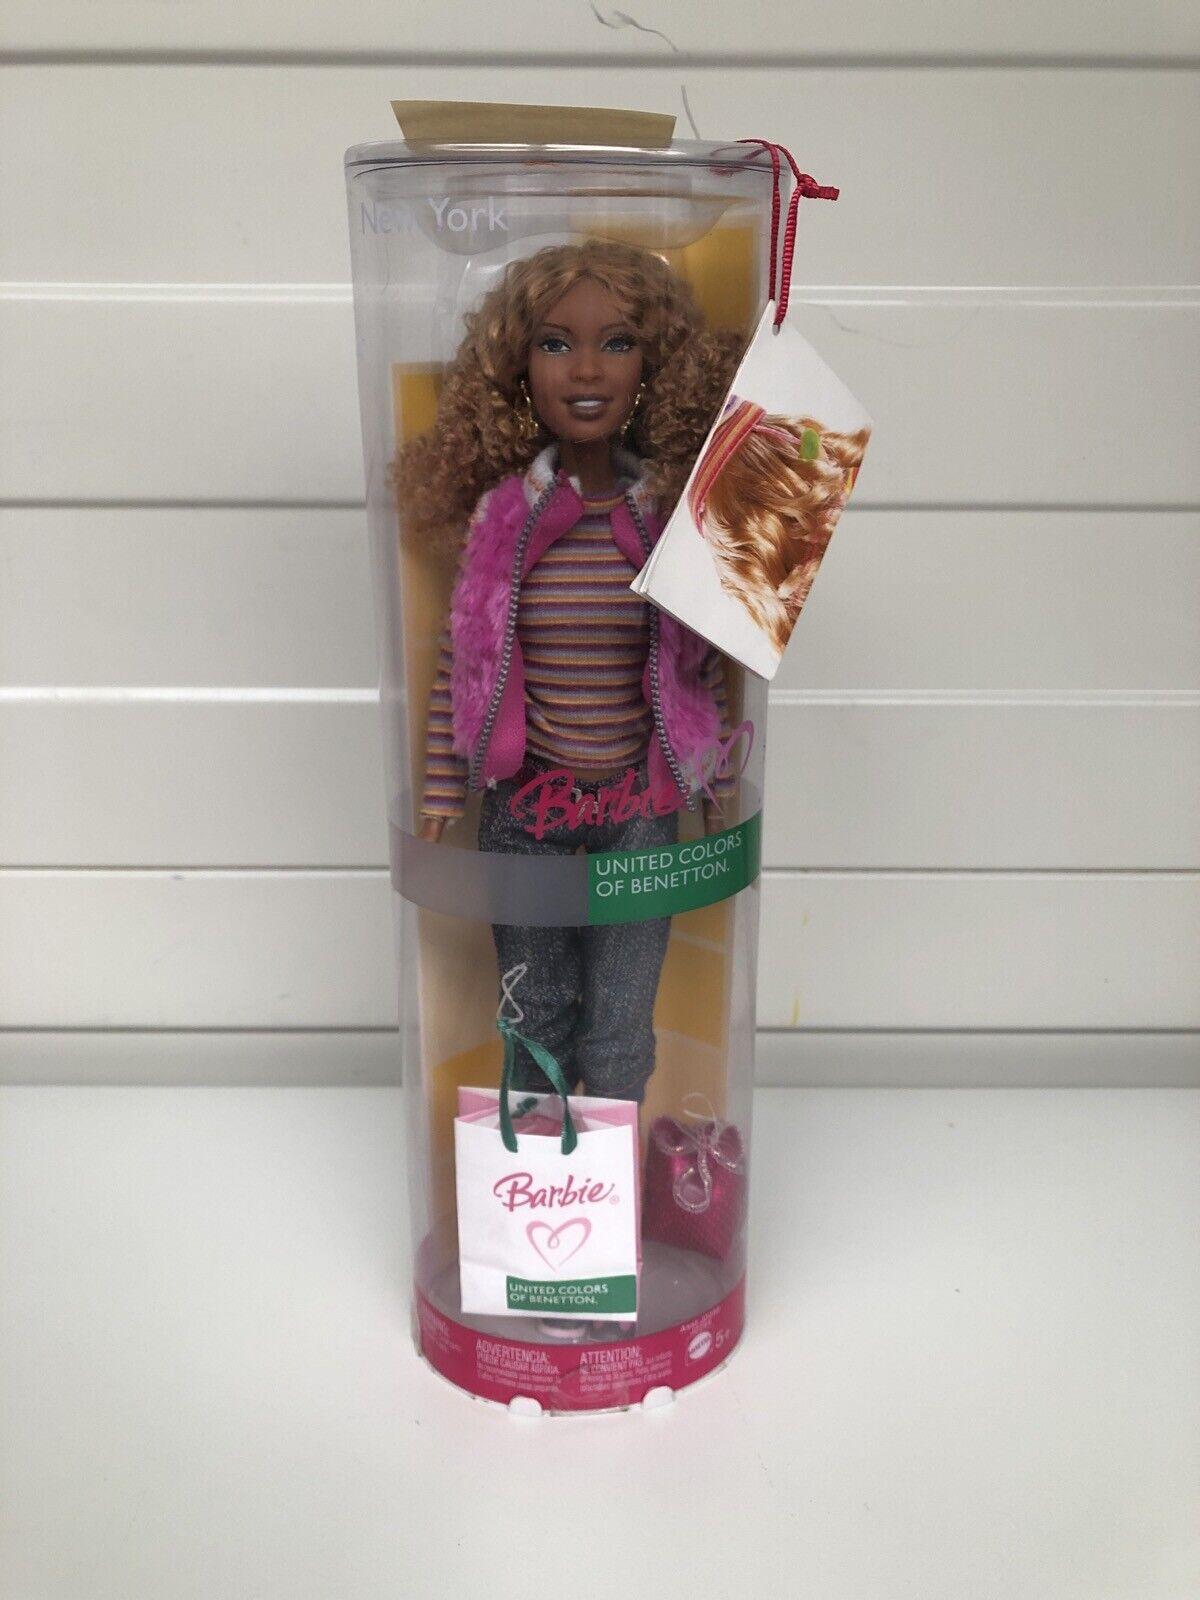 Barbie New York United Farbes of Benetton Doll NEU OVP